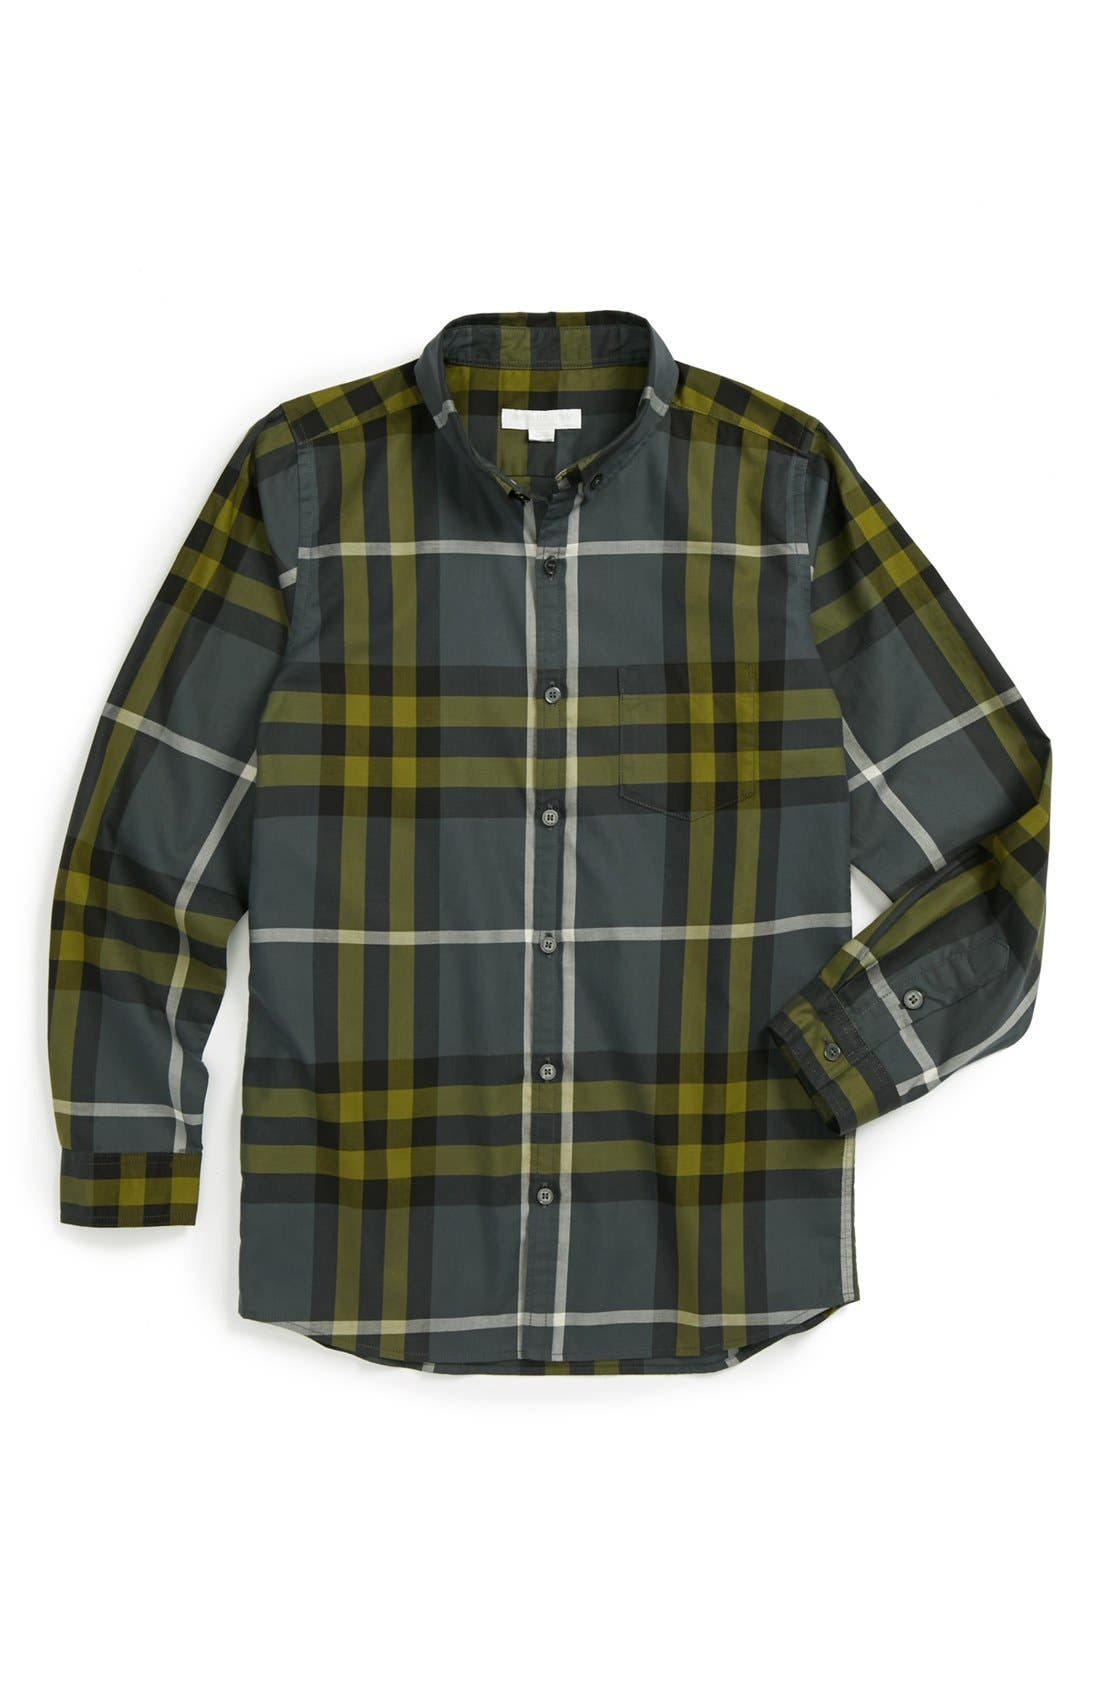 Alternate Image 1 Selected - Burberry Woven Shirt (Little Boys & Big Boys)